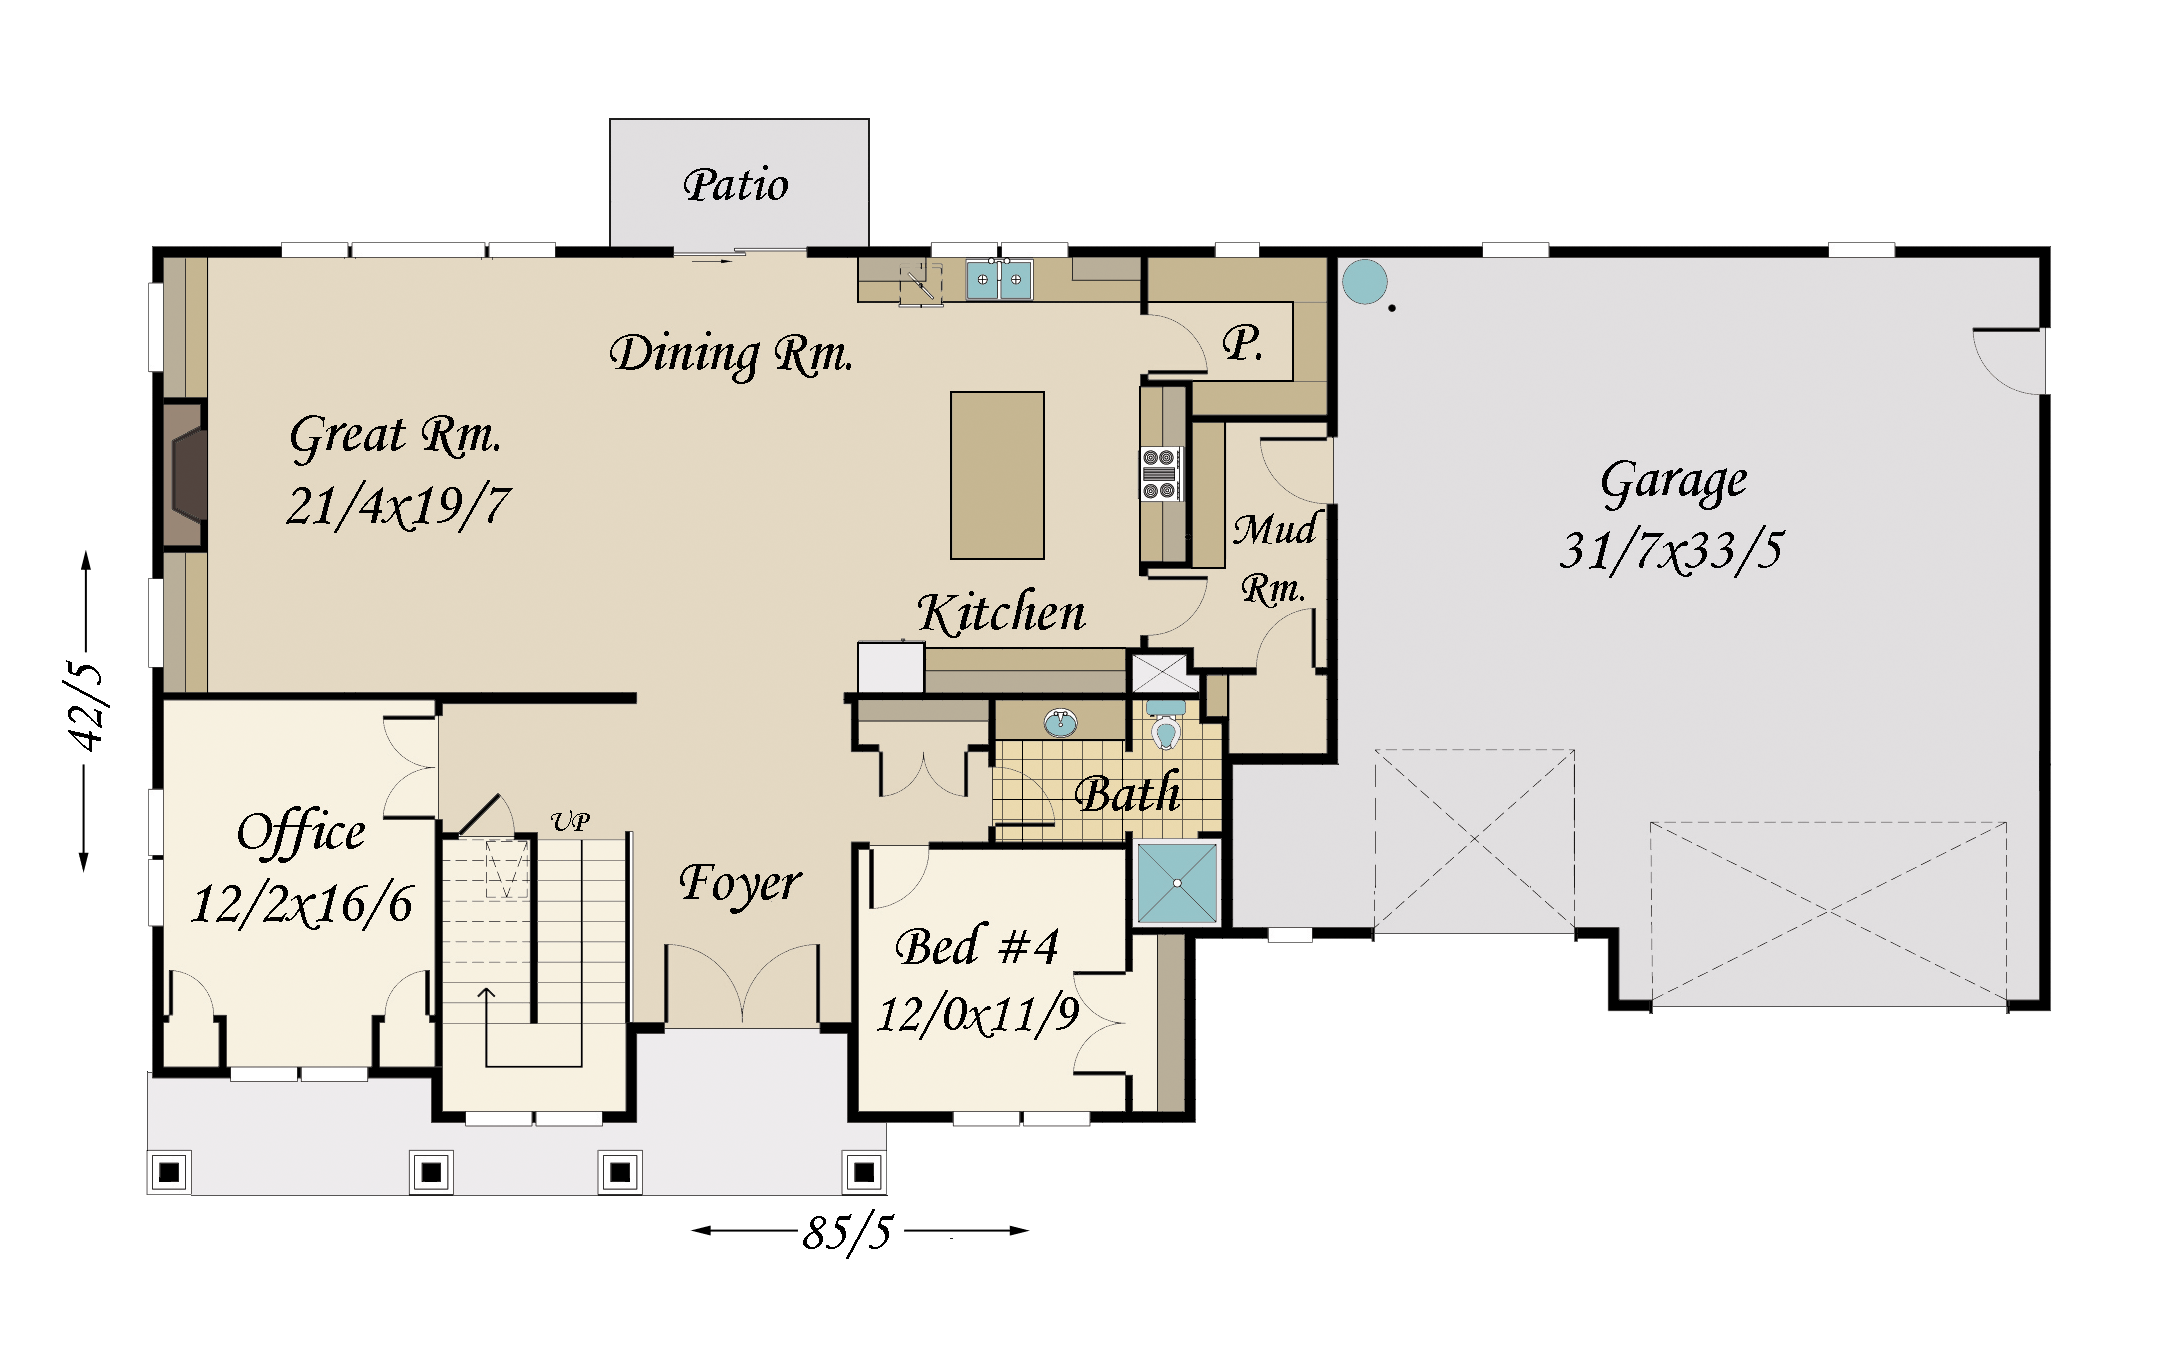 Morrison 2 house plan built in city of portland for City lot house plans